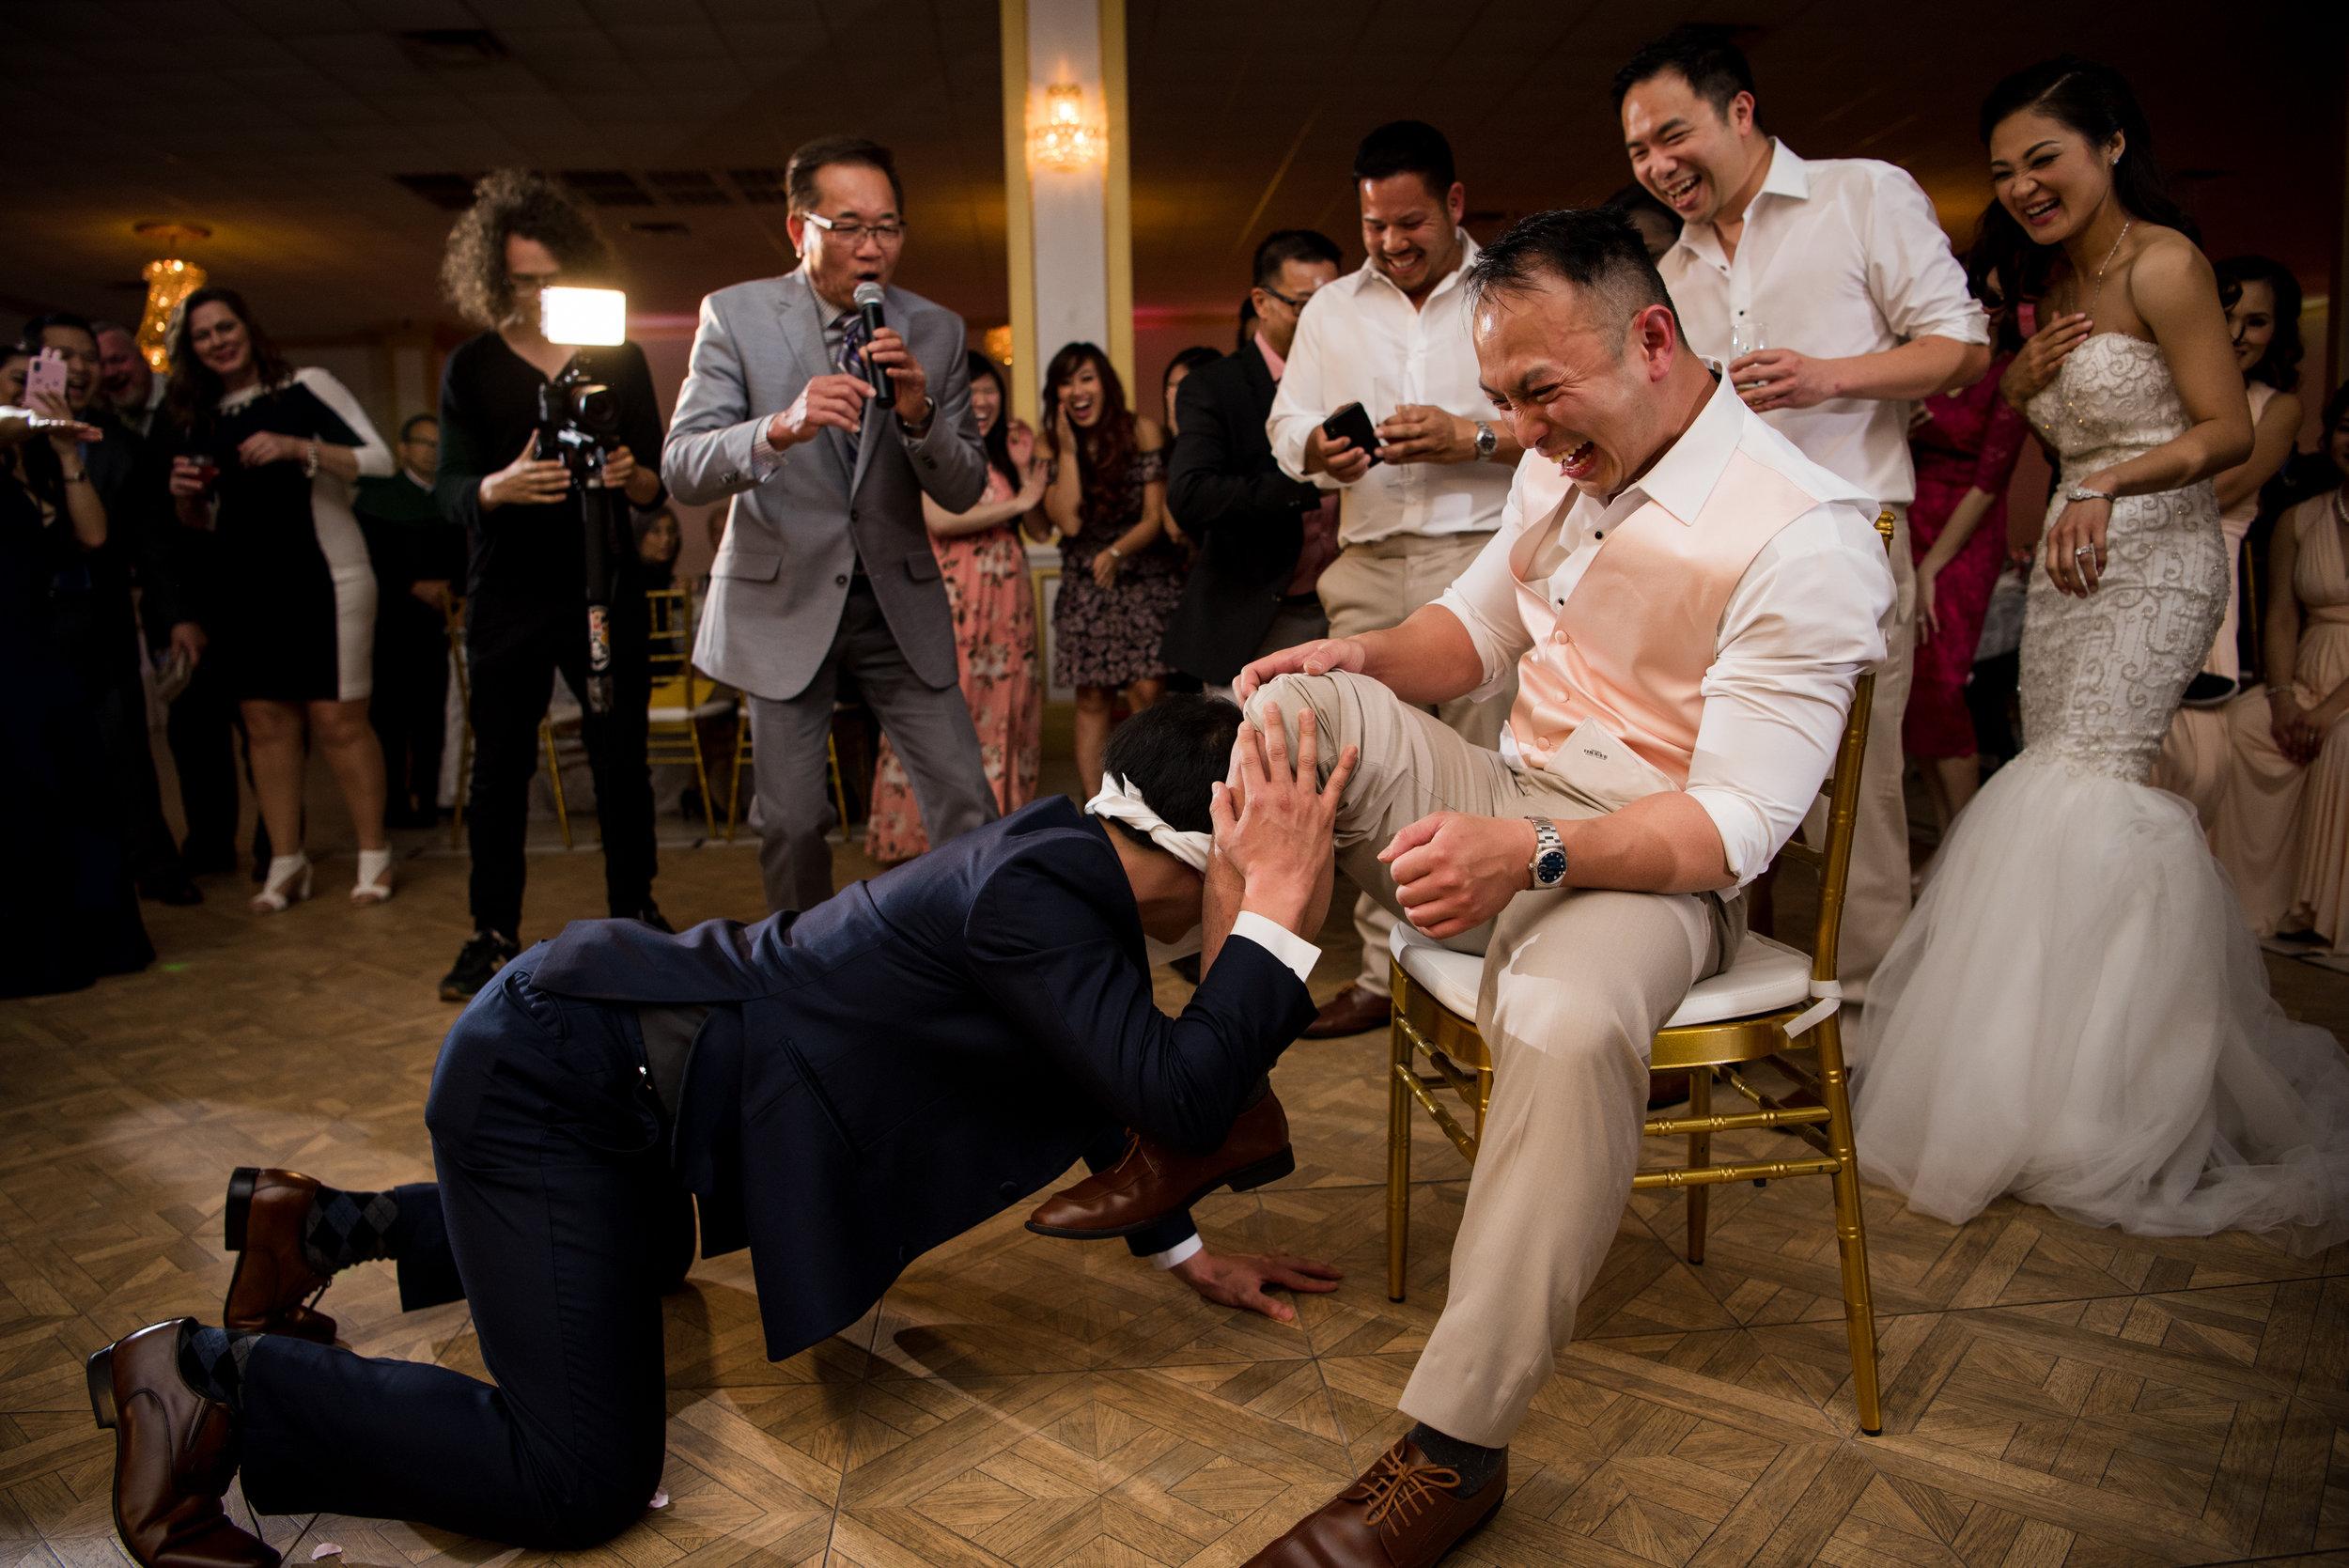 cece-david-wedding-favorites-222.jpg